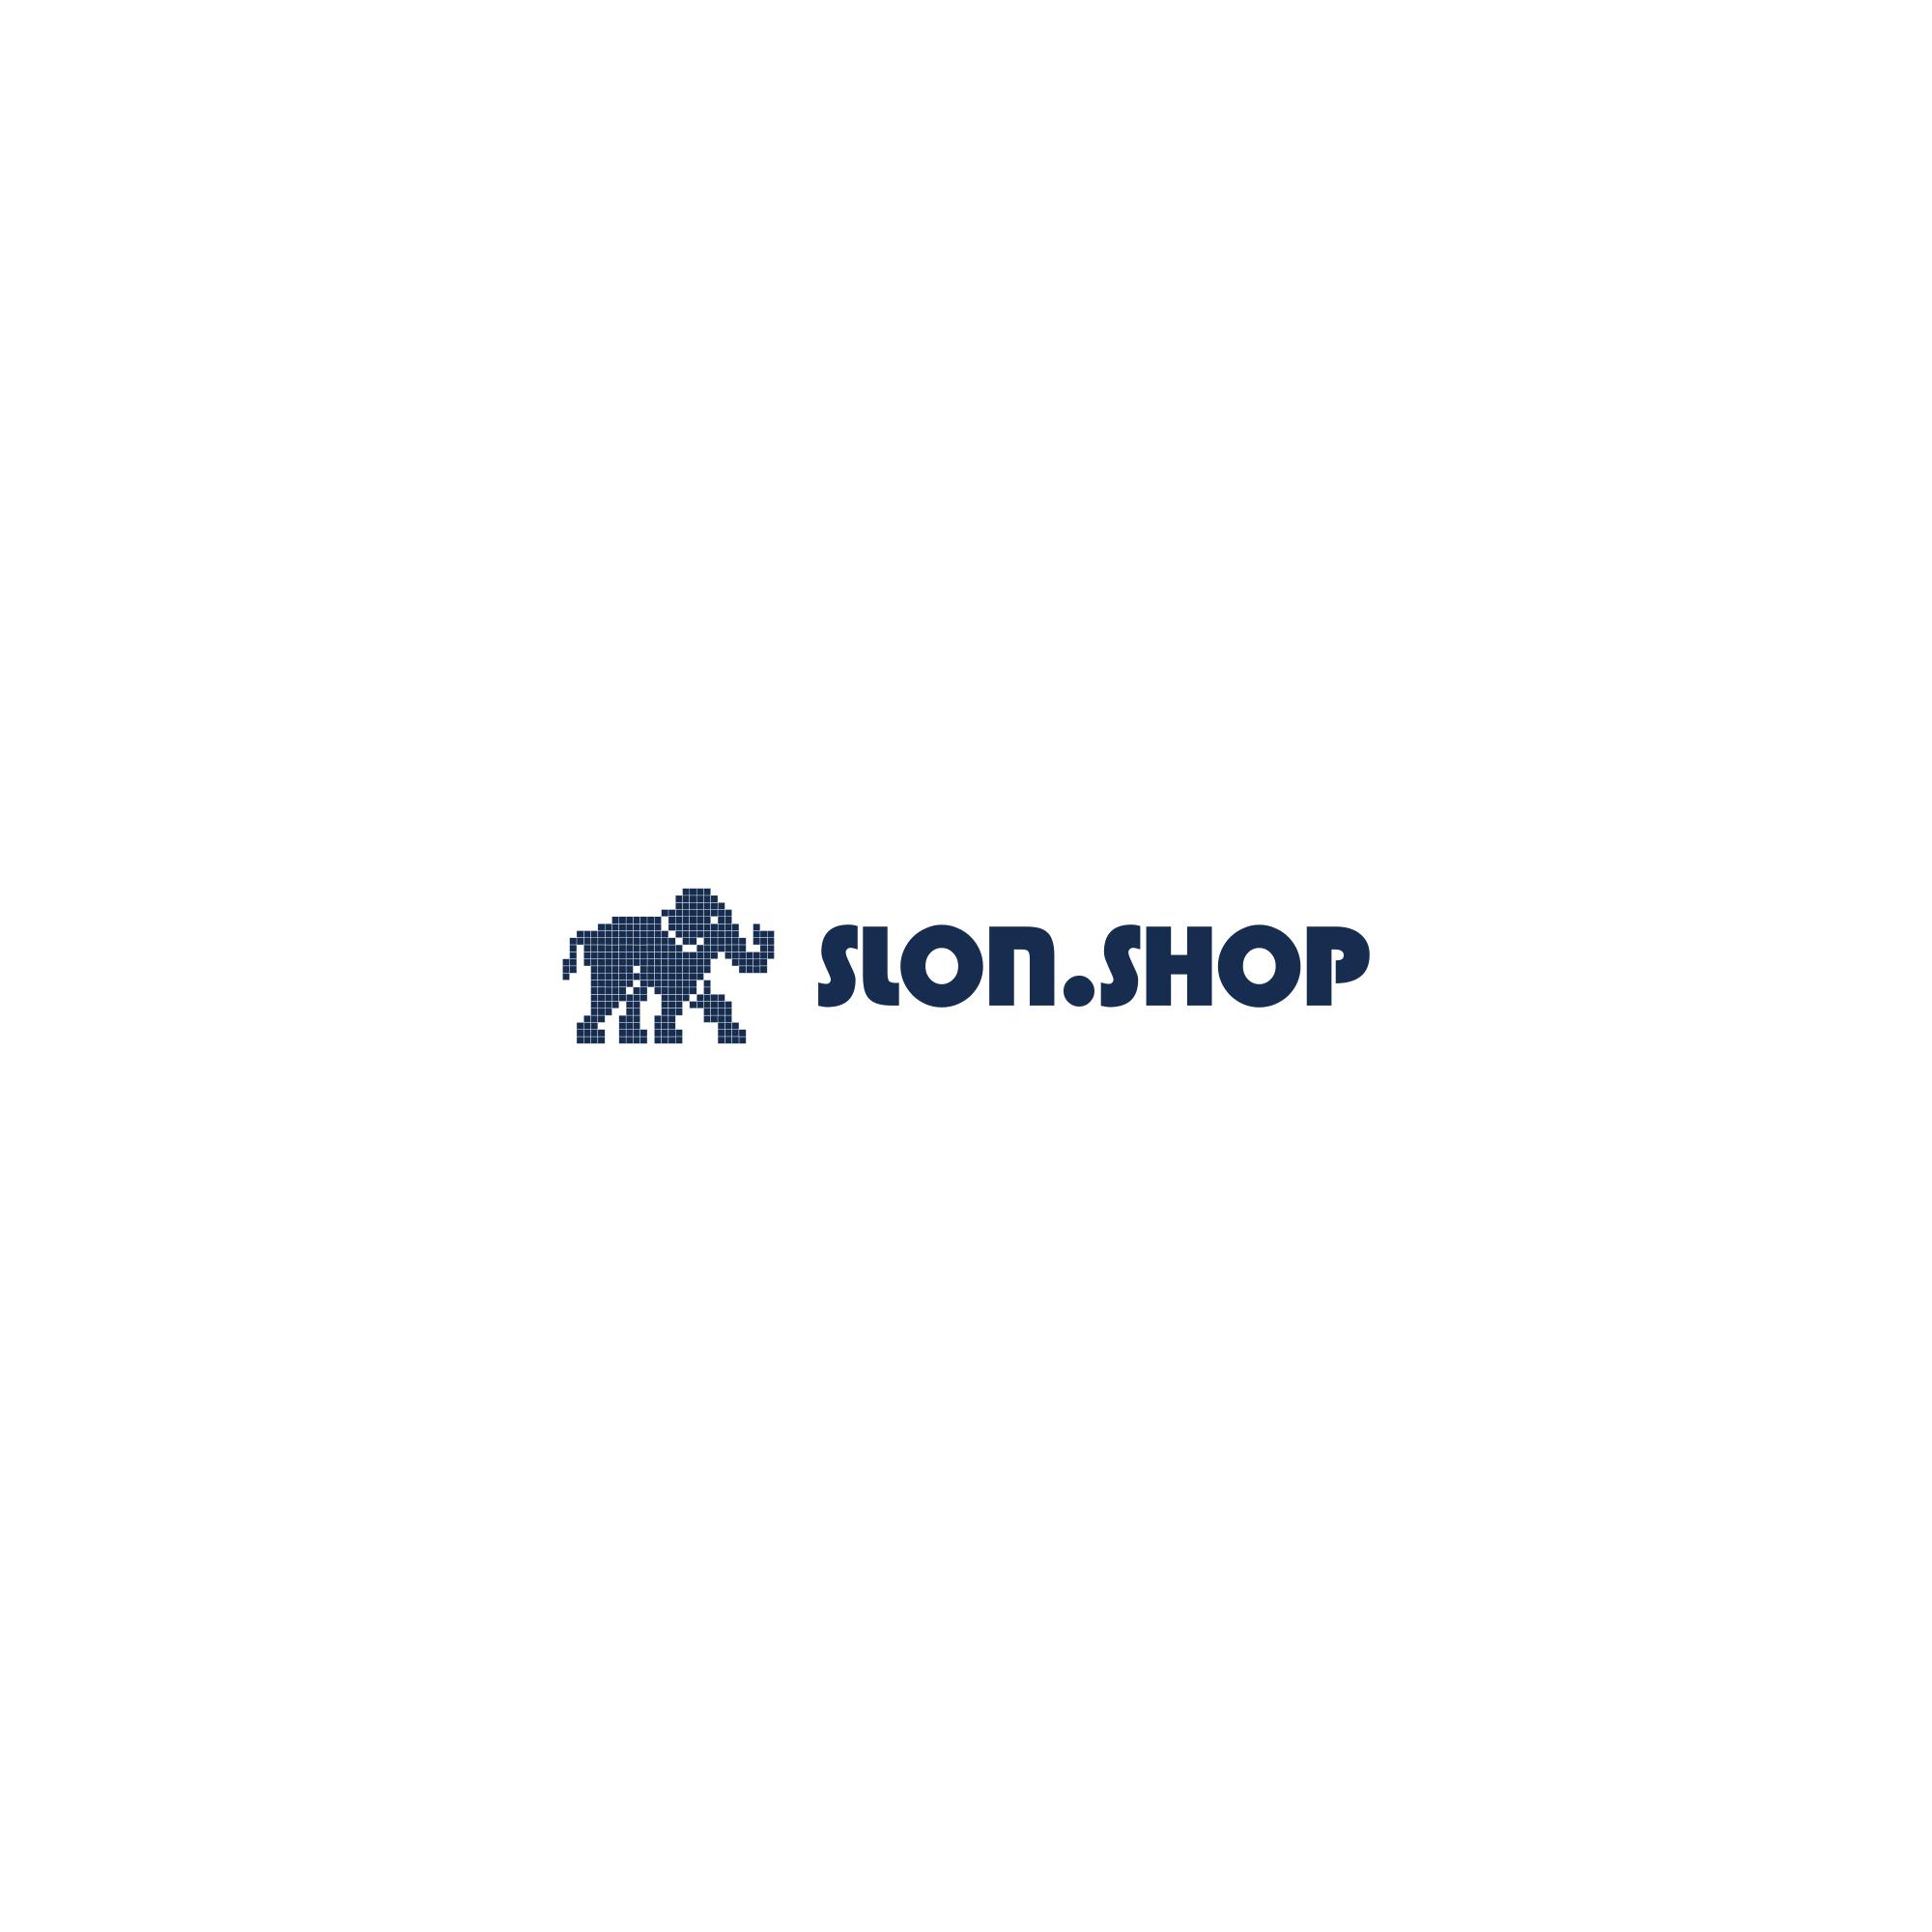 Разработать логотип и фирменный стиль интернет-магазина  фото f_44359915c6dae11d.png